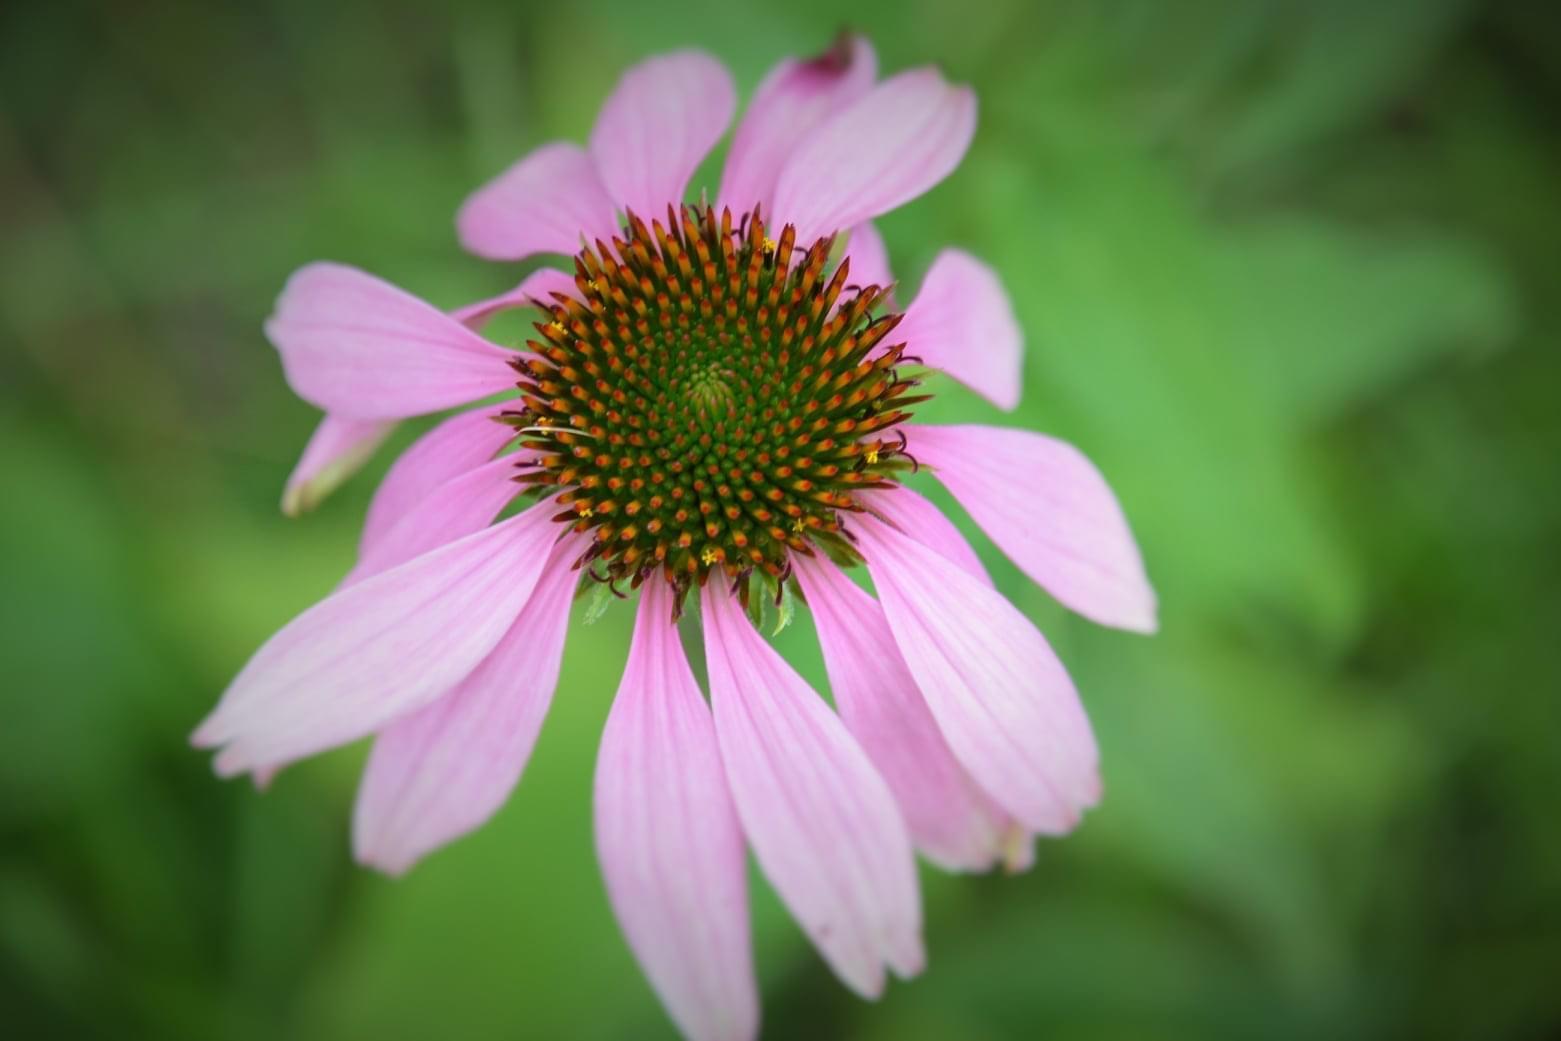 Zahrada - Obrázek č. 58